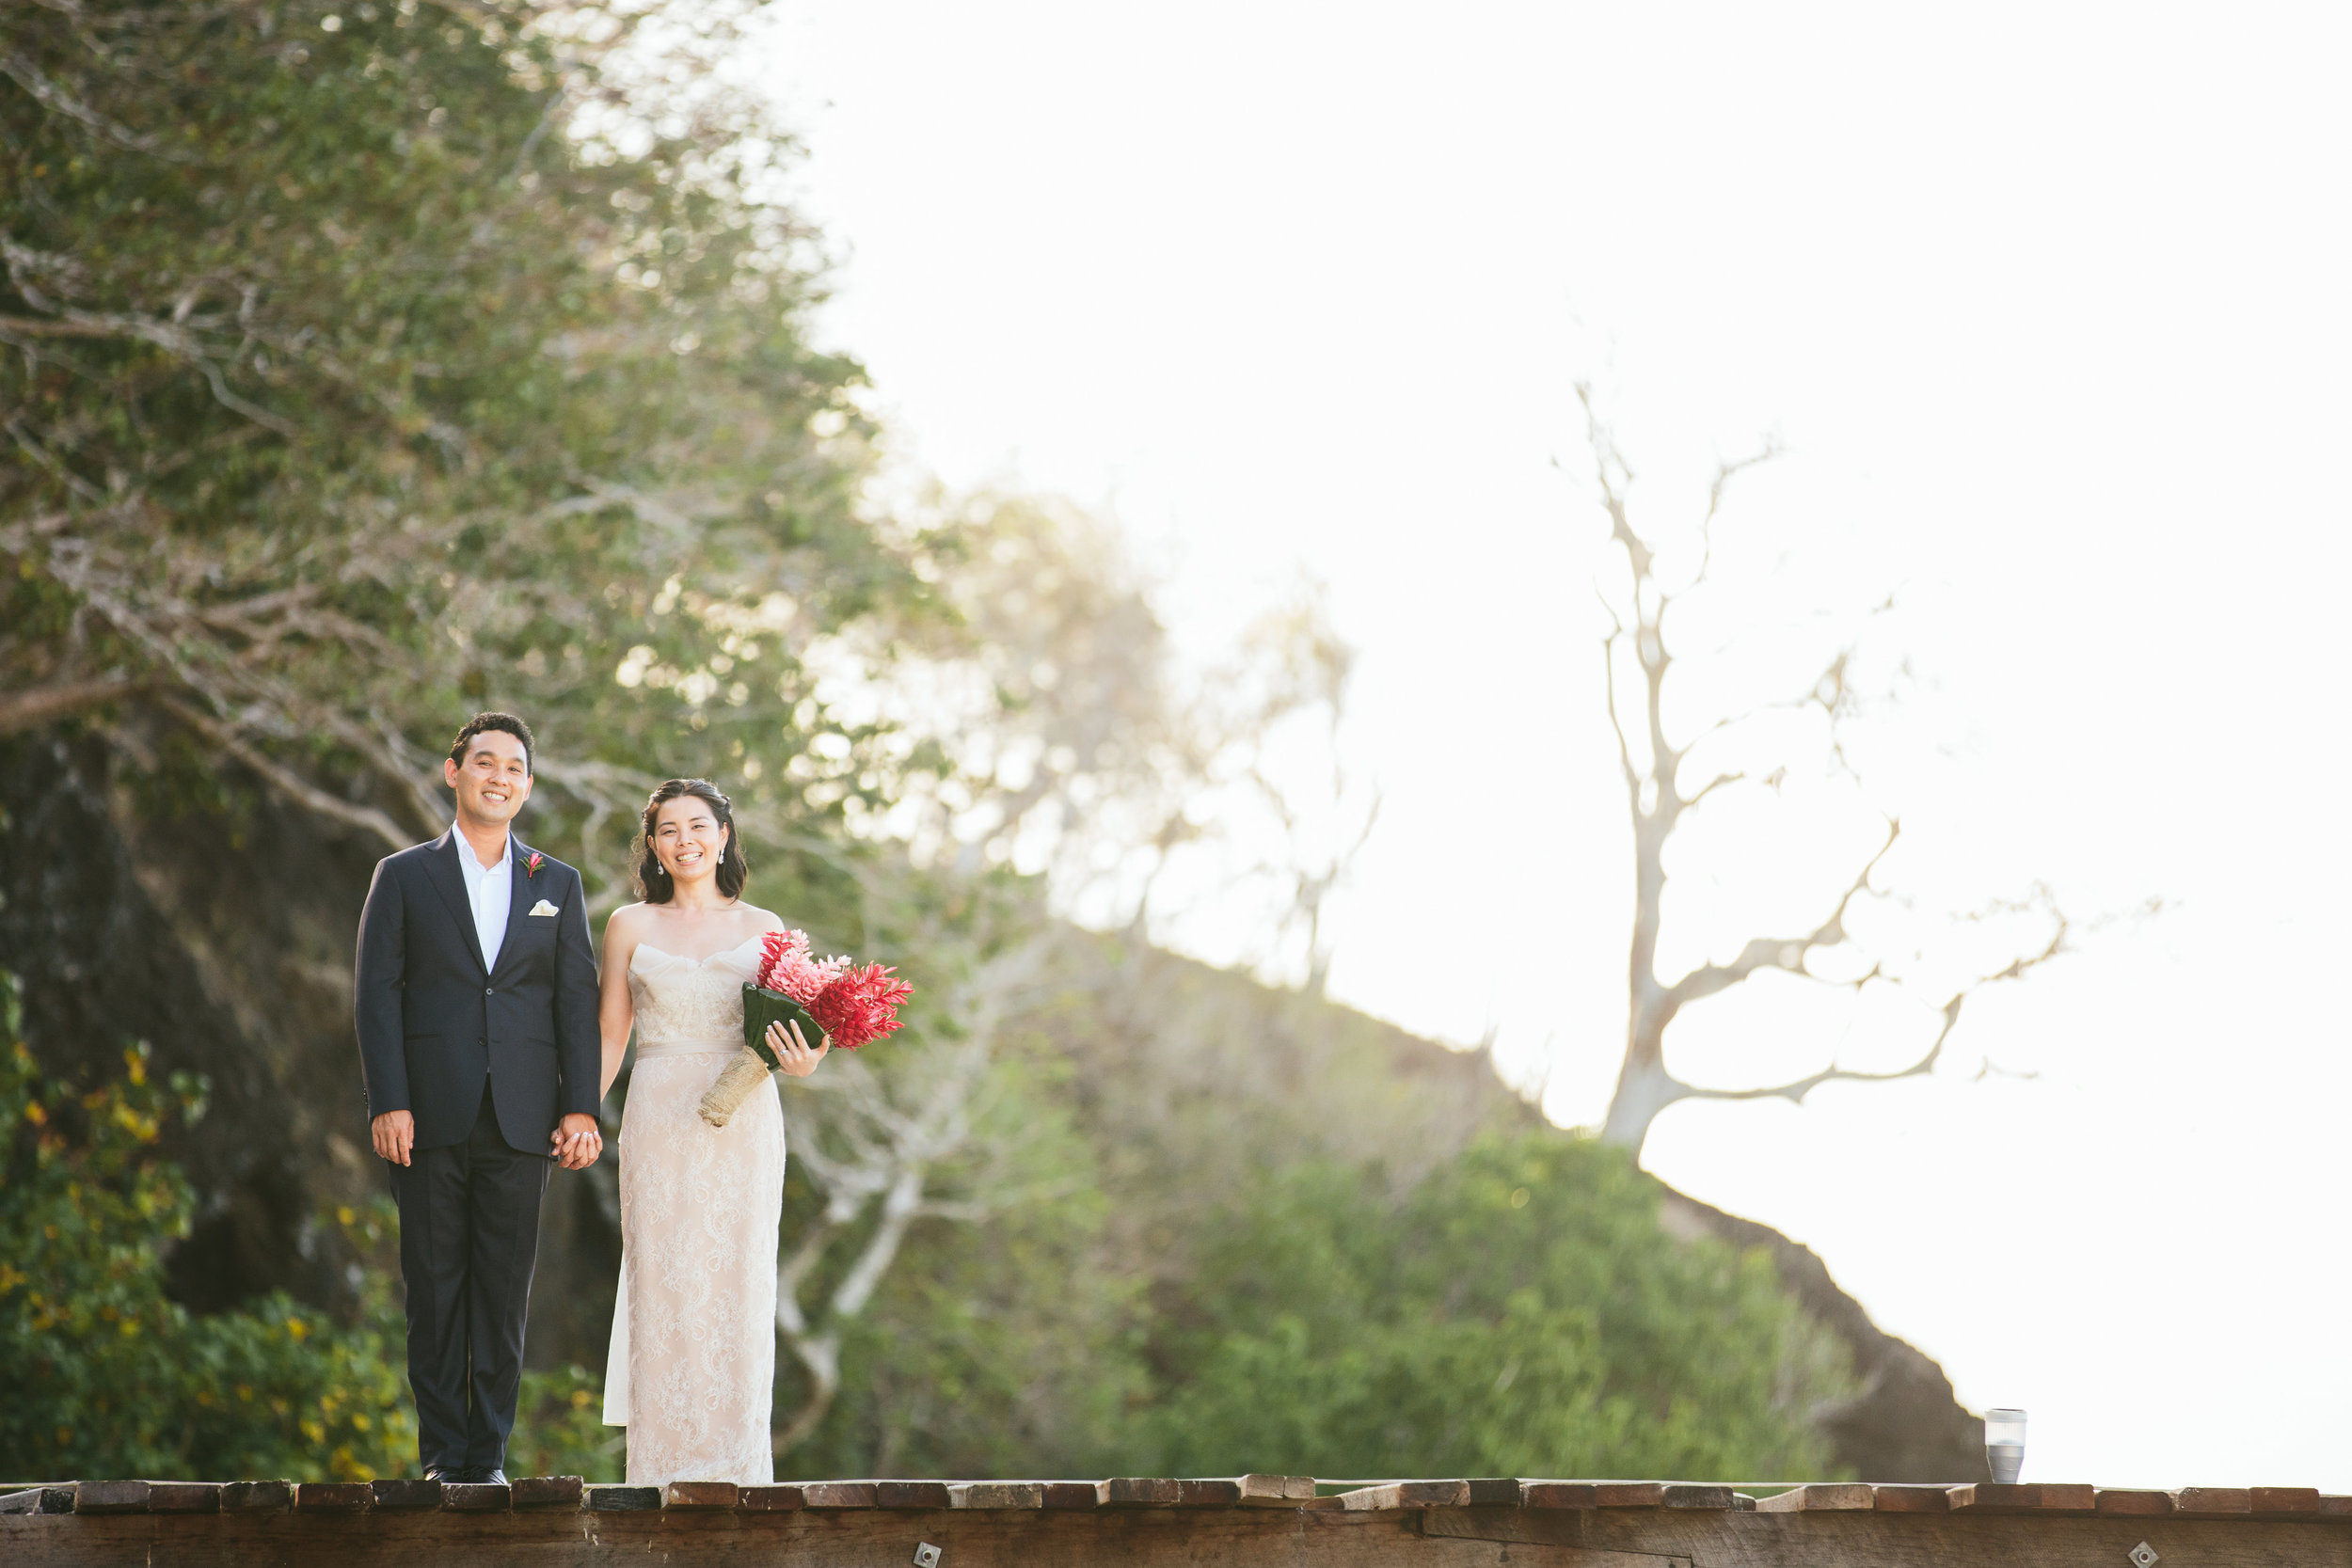 Fiji Wedding Elopement - The Remote Resort Fiji Islands - Jetty